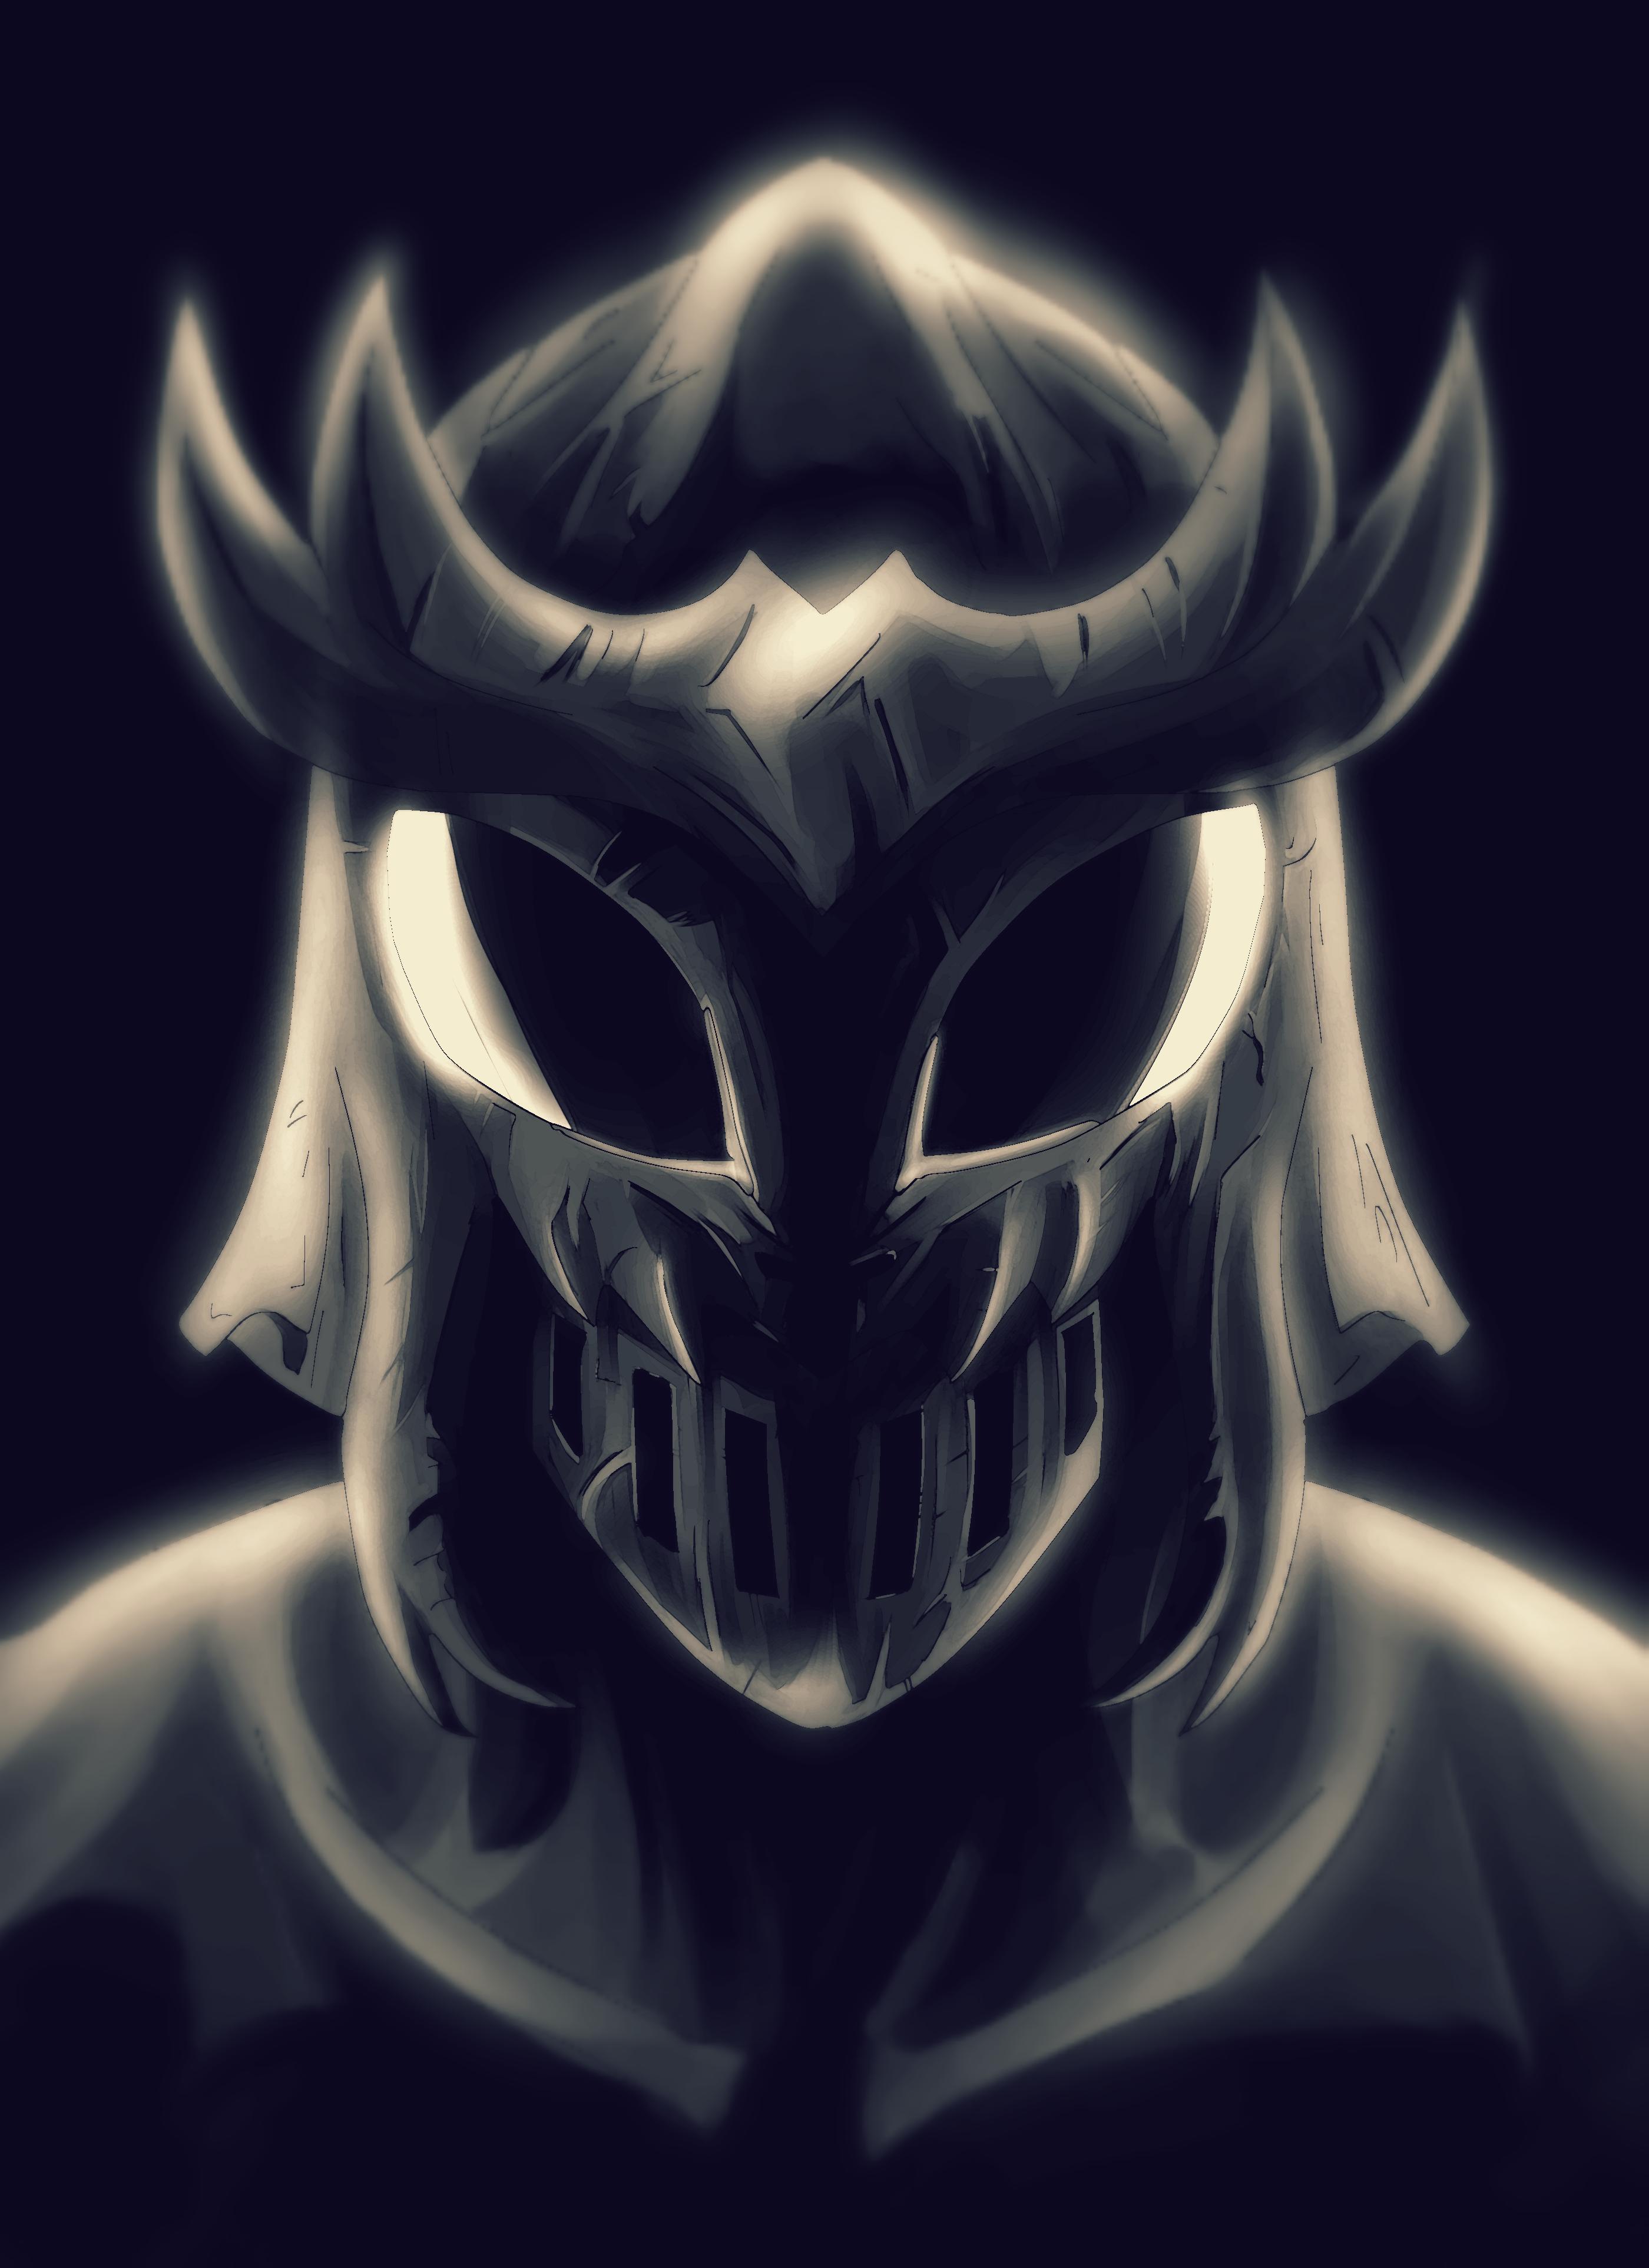 Beetle Knight by MachineRule